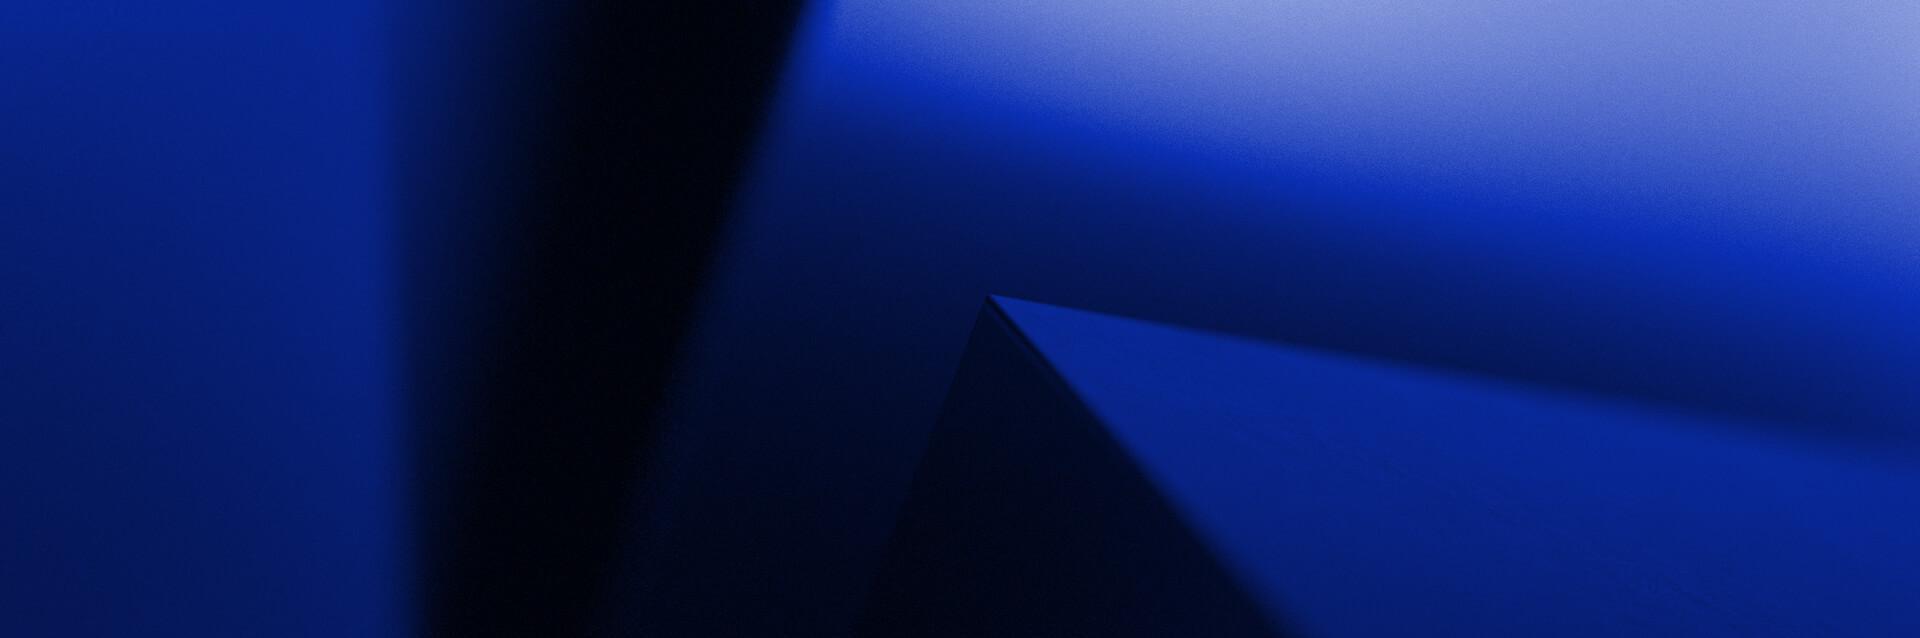 rra-background-blue-11-2021.jpg